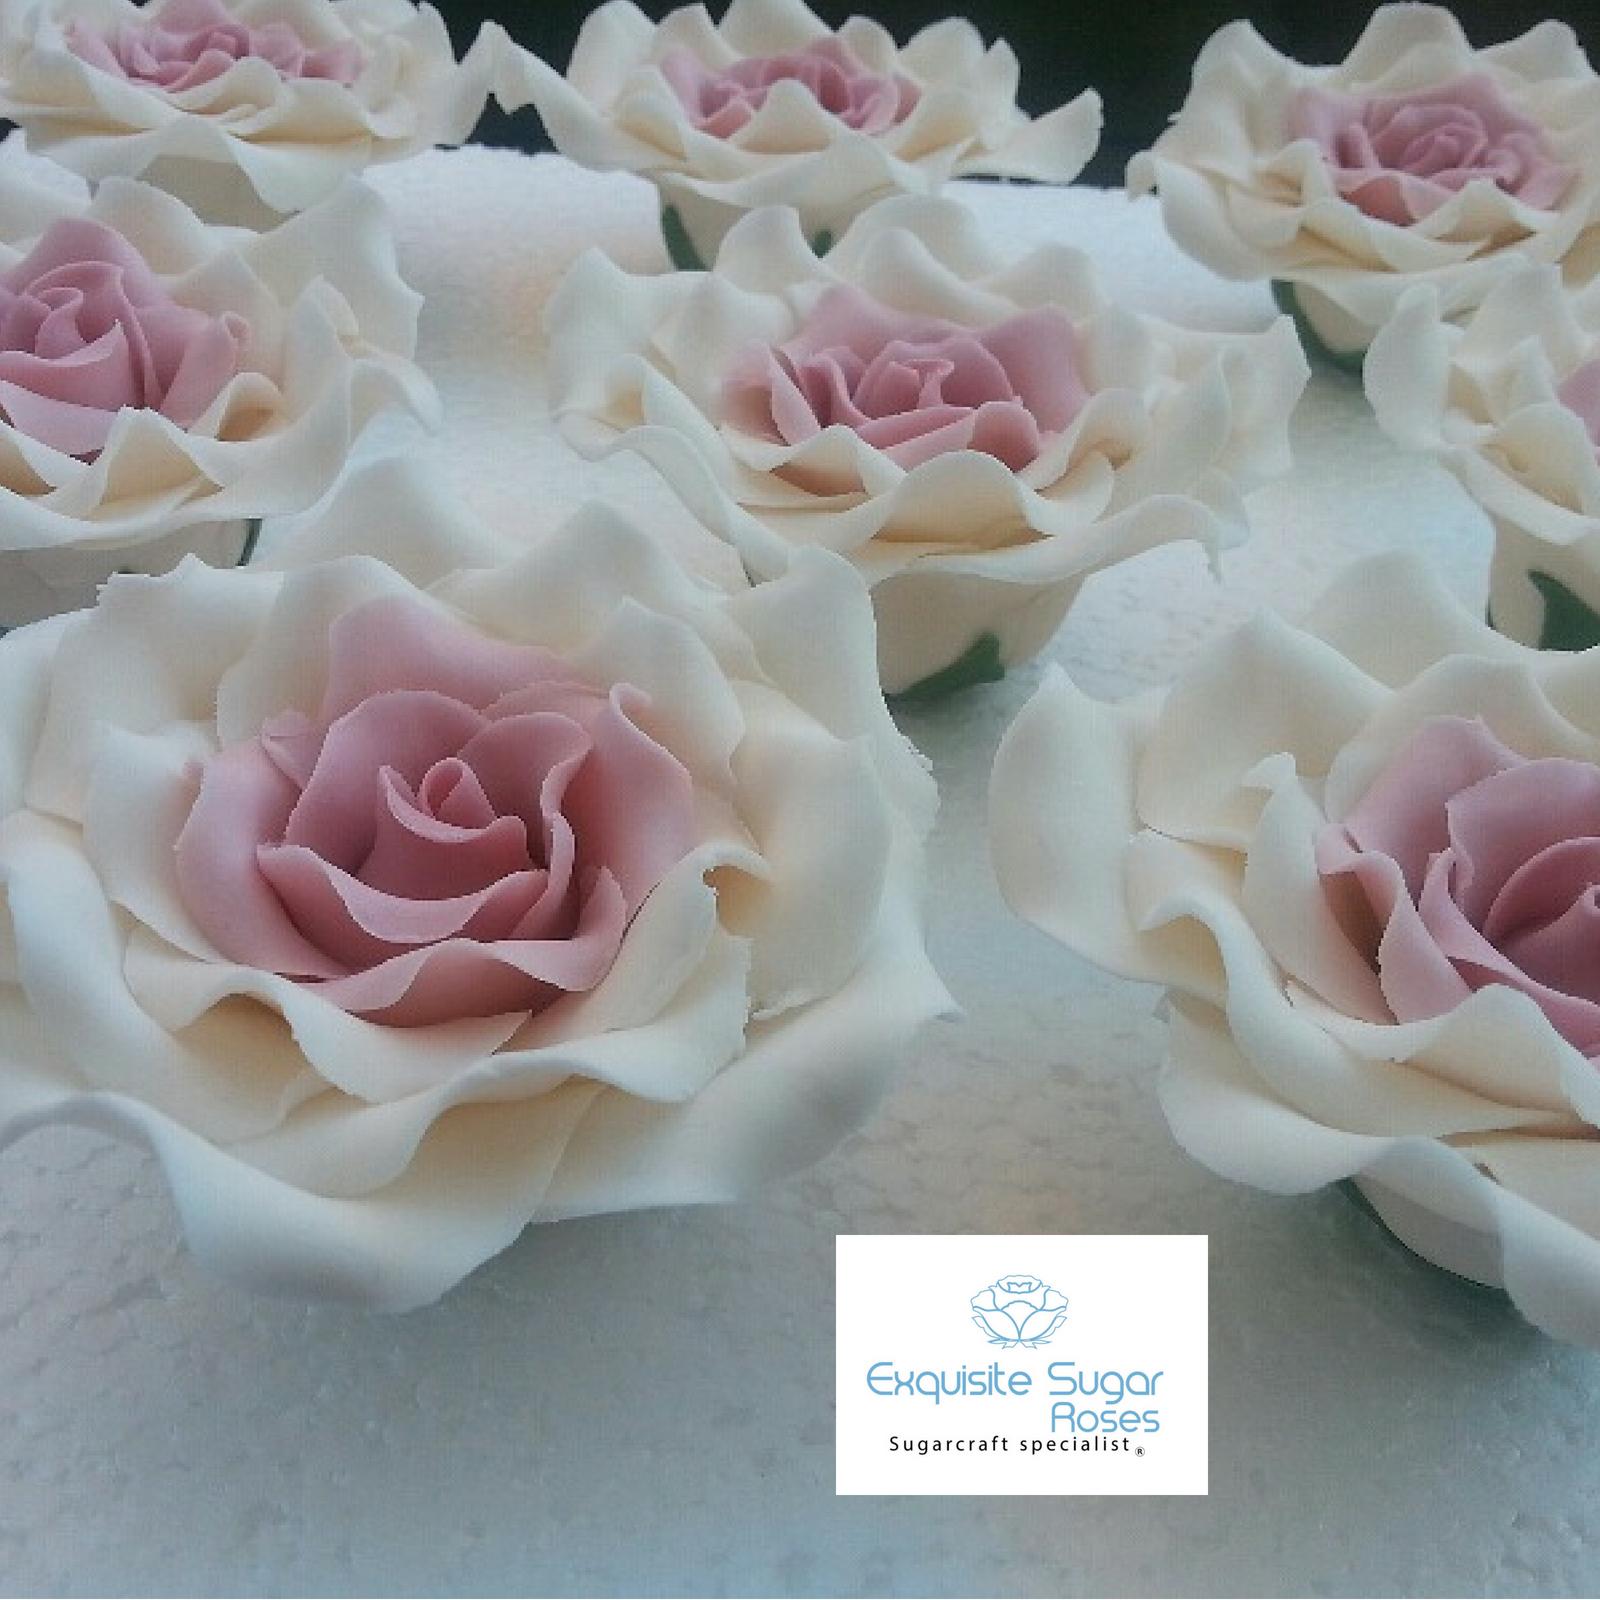 Sugar Roses Wedding Birthday Cake Topper Flower Decoration Multi Buy Pay 1 P P Ebay